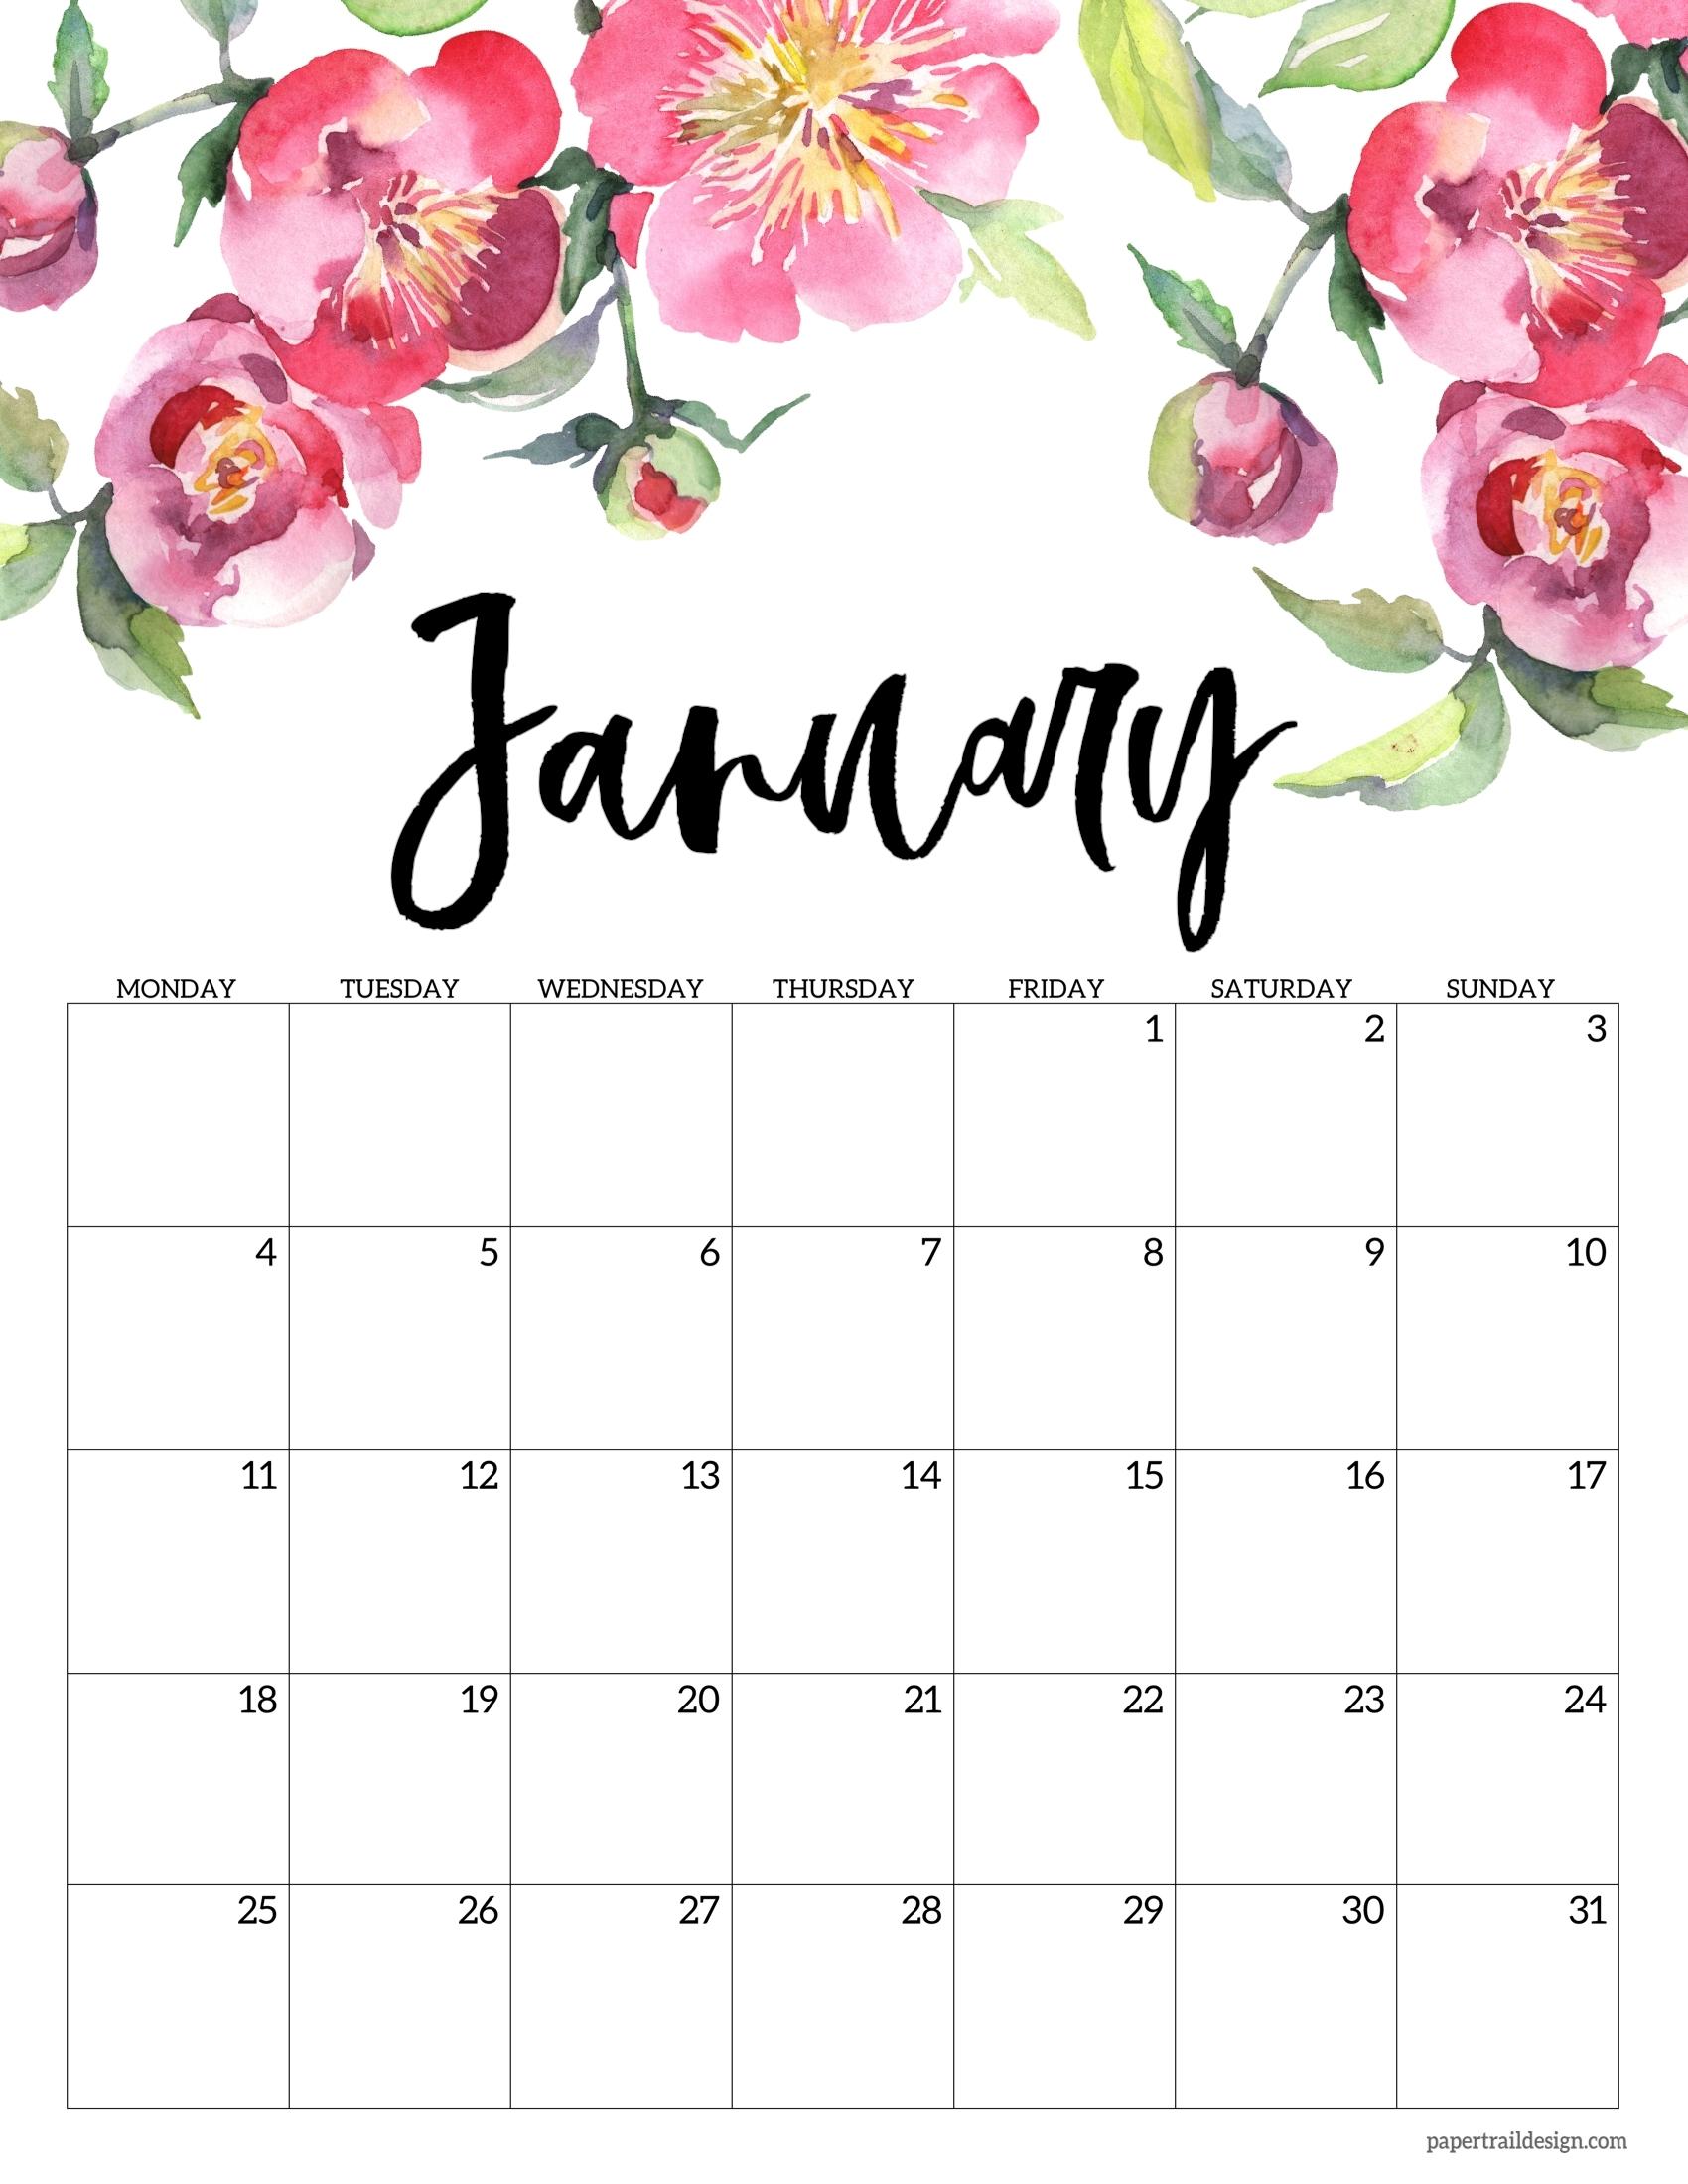 Free Printable 2021 Floral Calendar - Monday Start   Paper